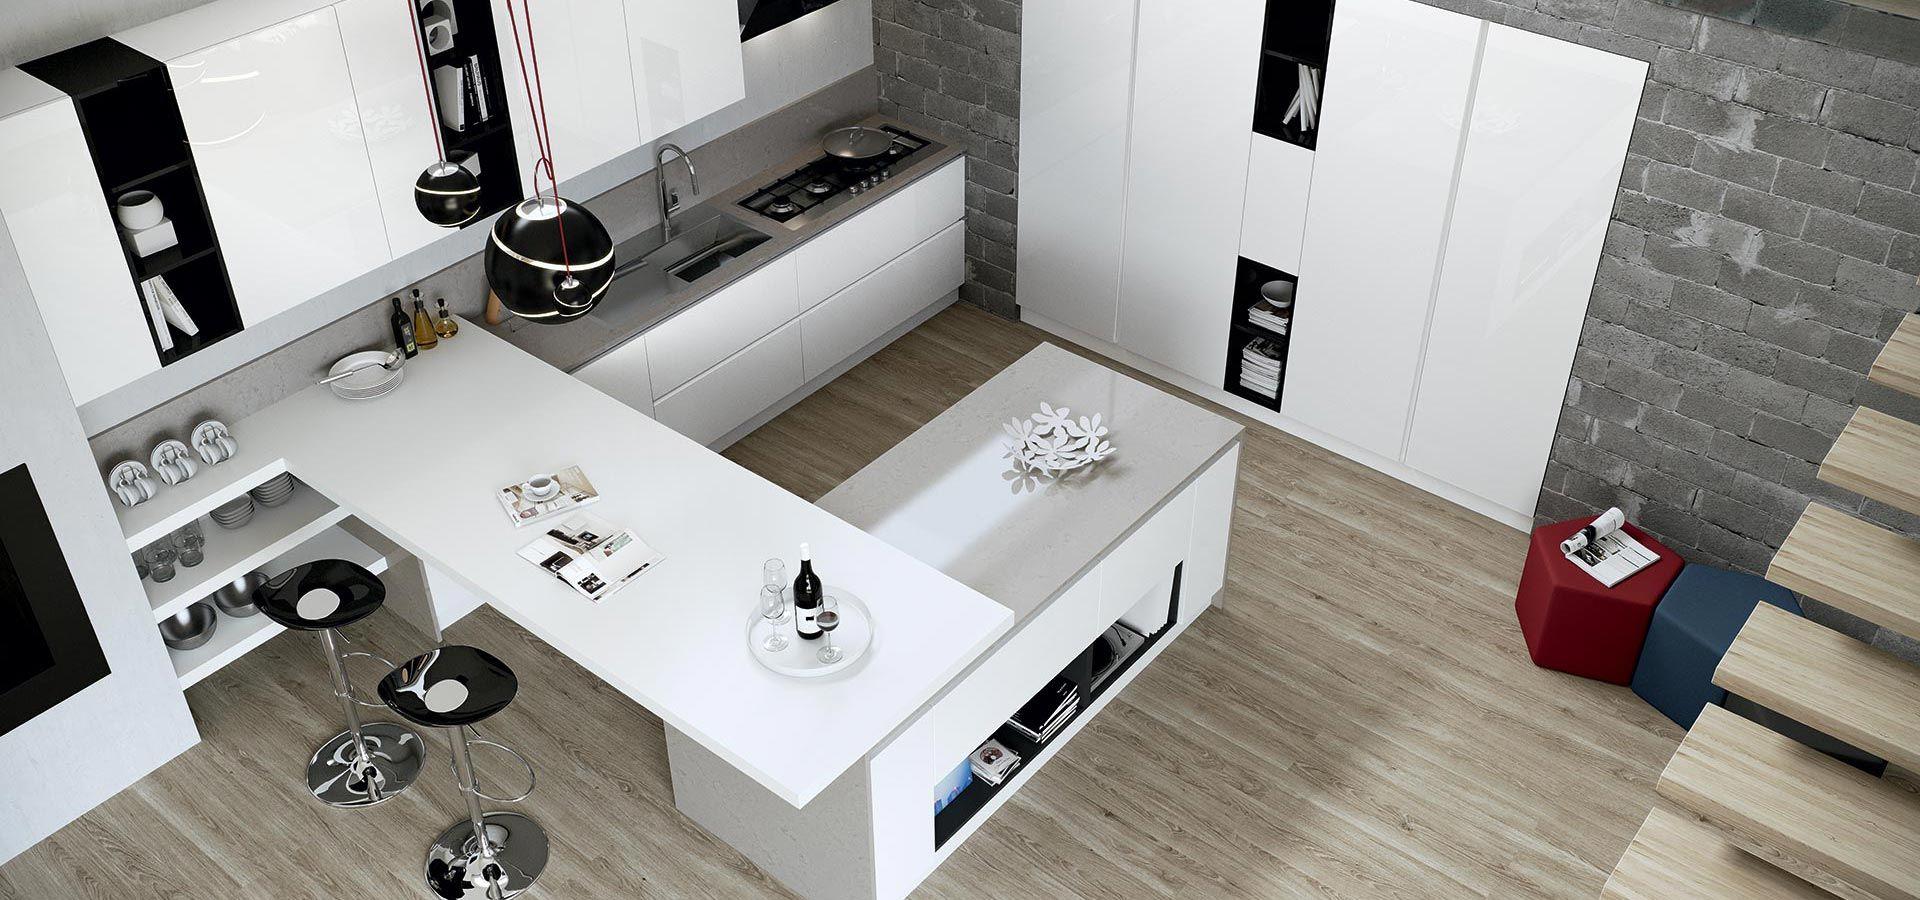 Cucina moderna round finitura bianco vani a giorno - Okite piano cucina ...